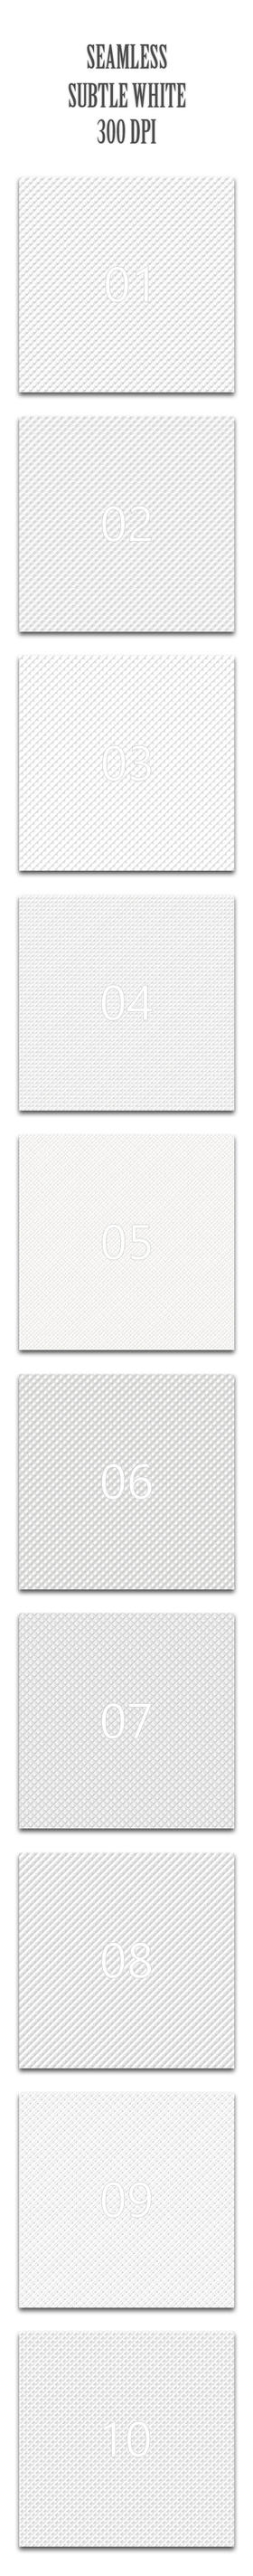 Seamless Subtle White by Kluzya